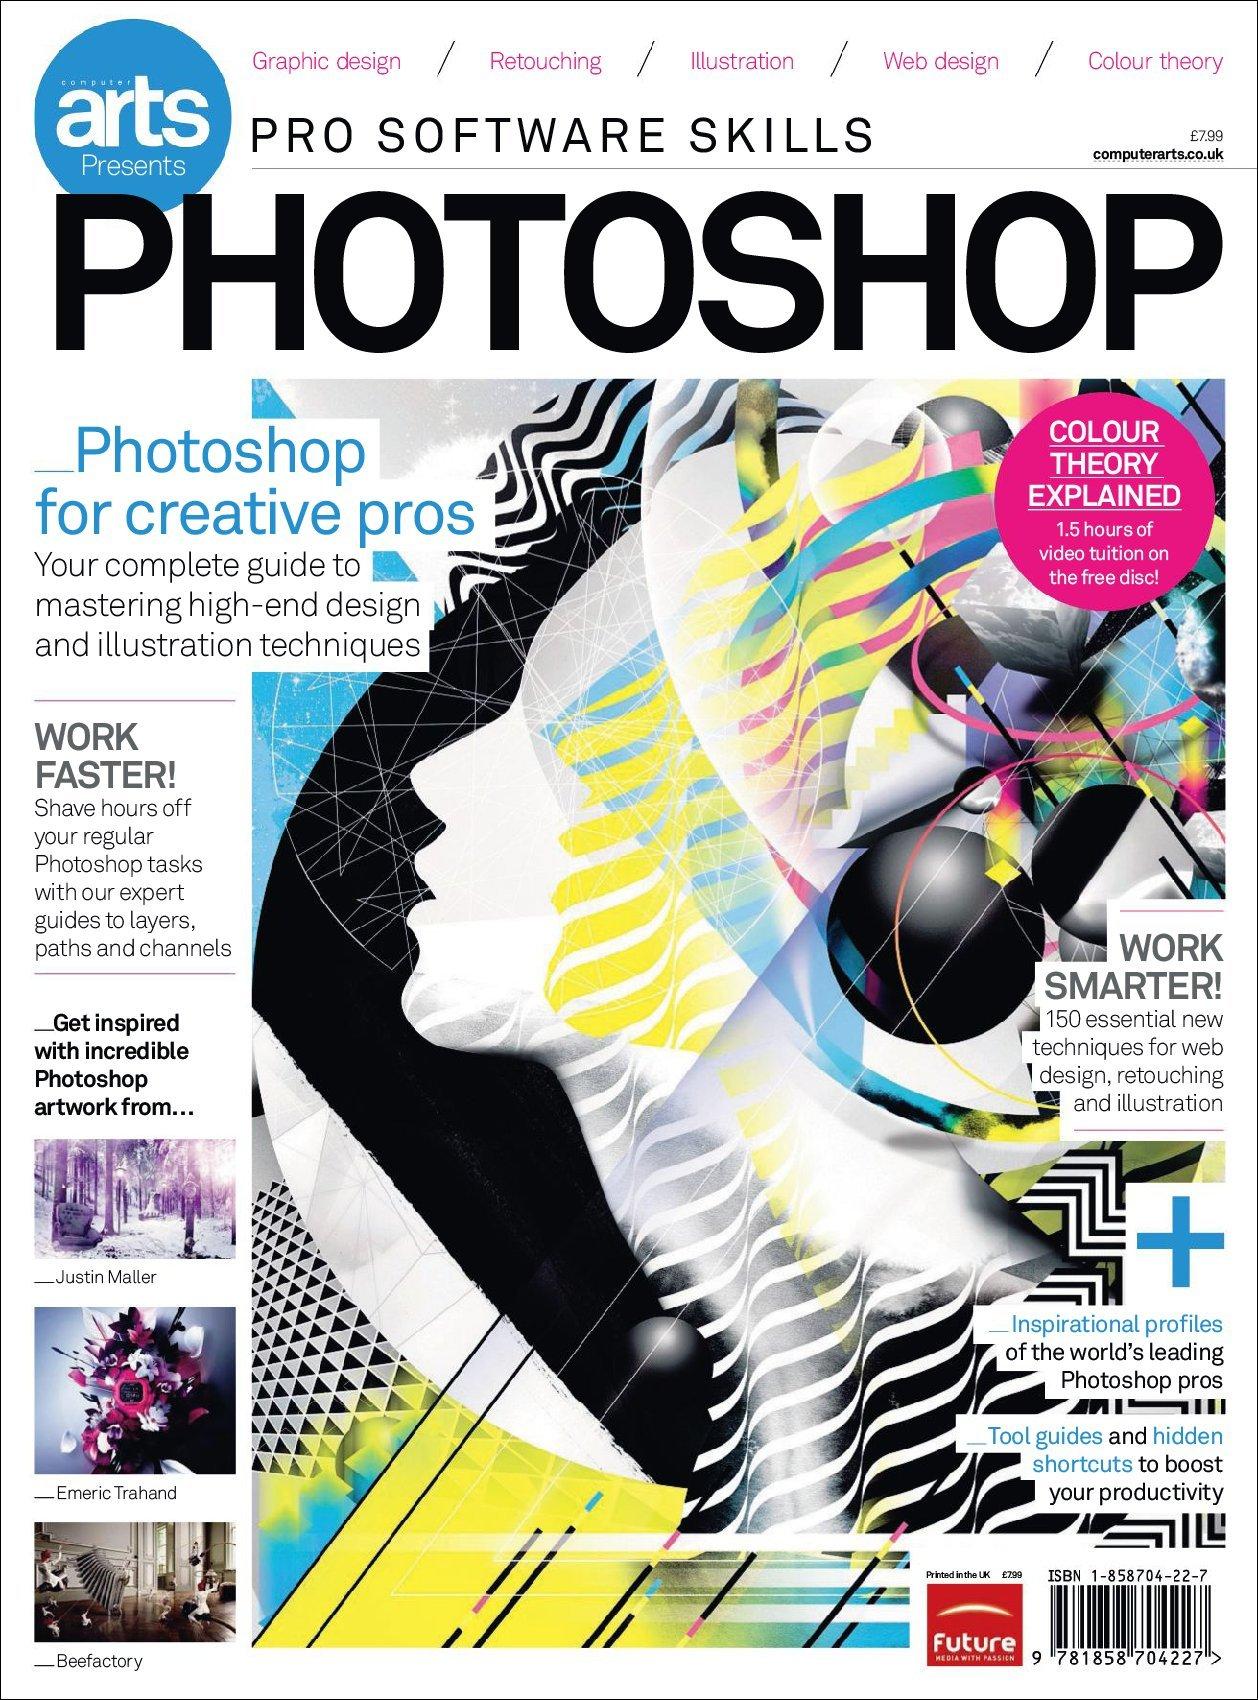 Computer Arts Pro Software Guide Photoshop Digital